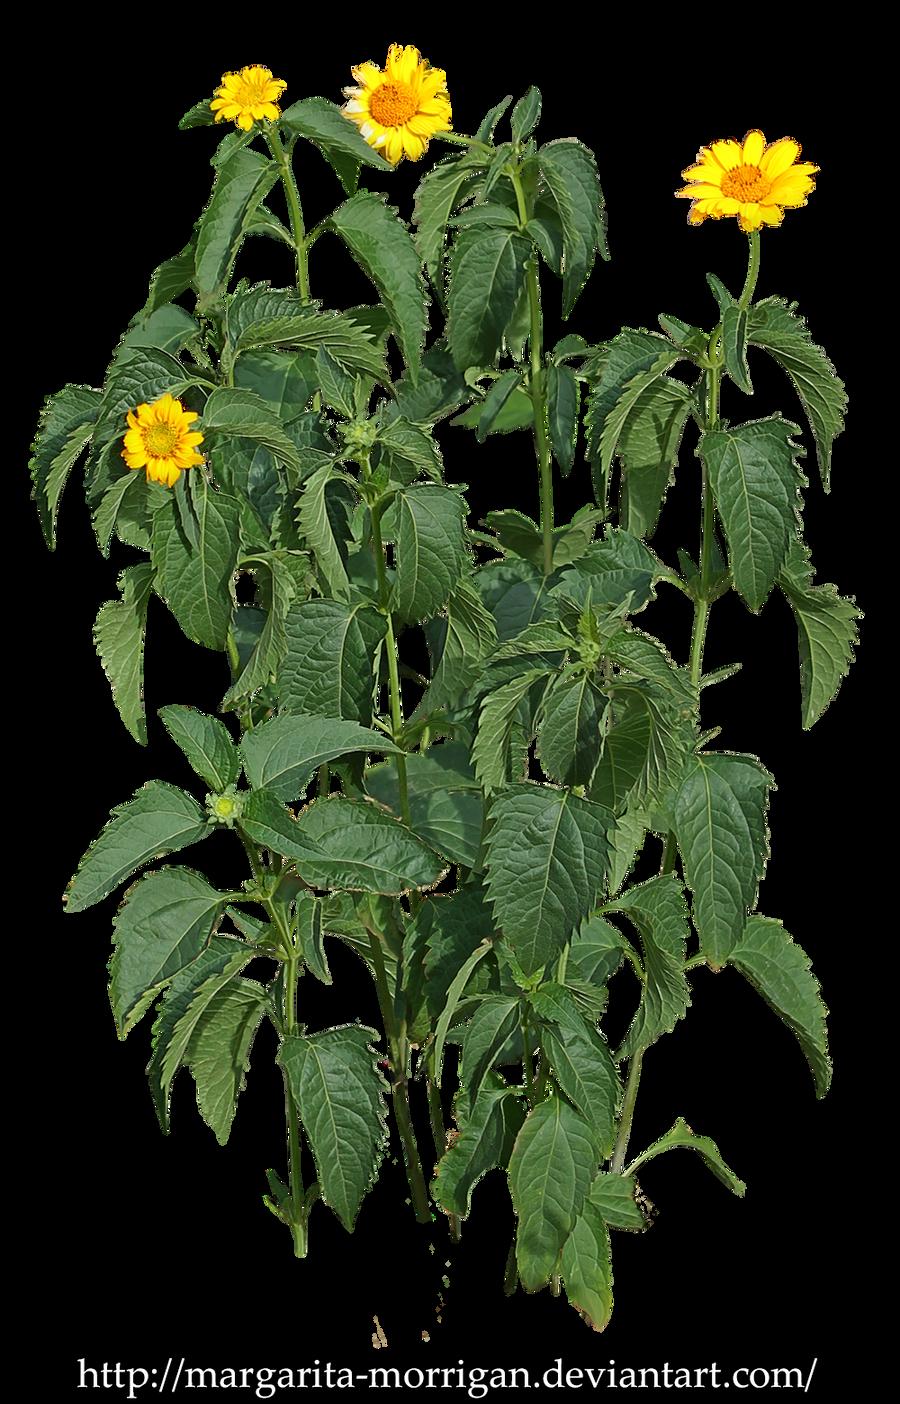 Plant with yellow flowers by margarita morrigan on deviantart plant with yellow flowers by margarita morrigan mightylinksfo